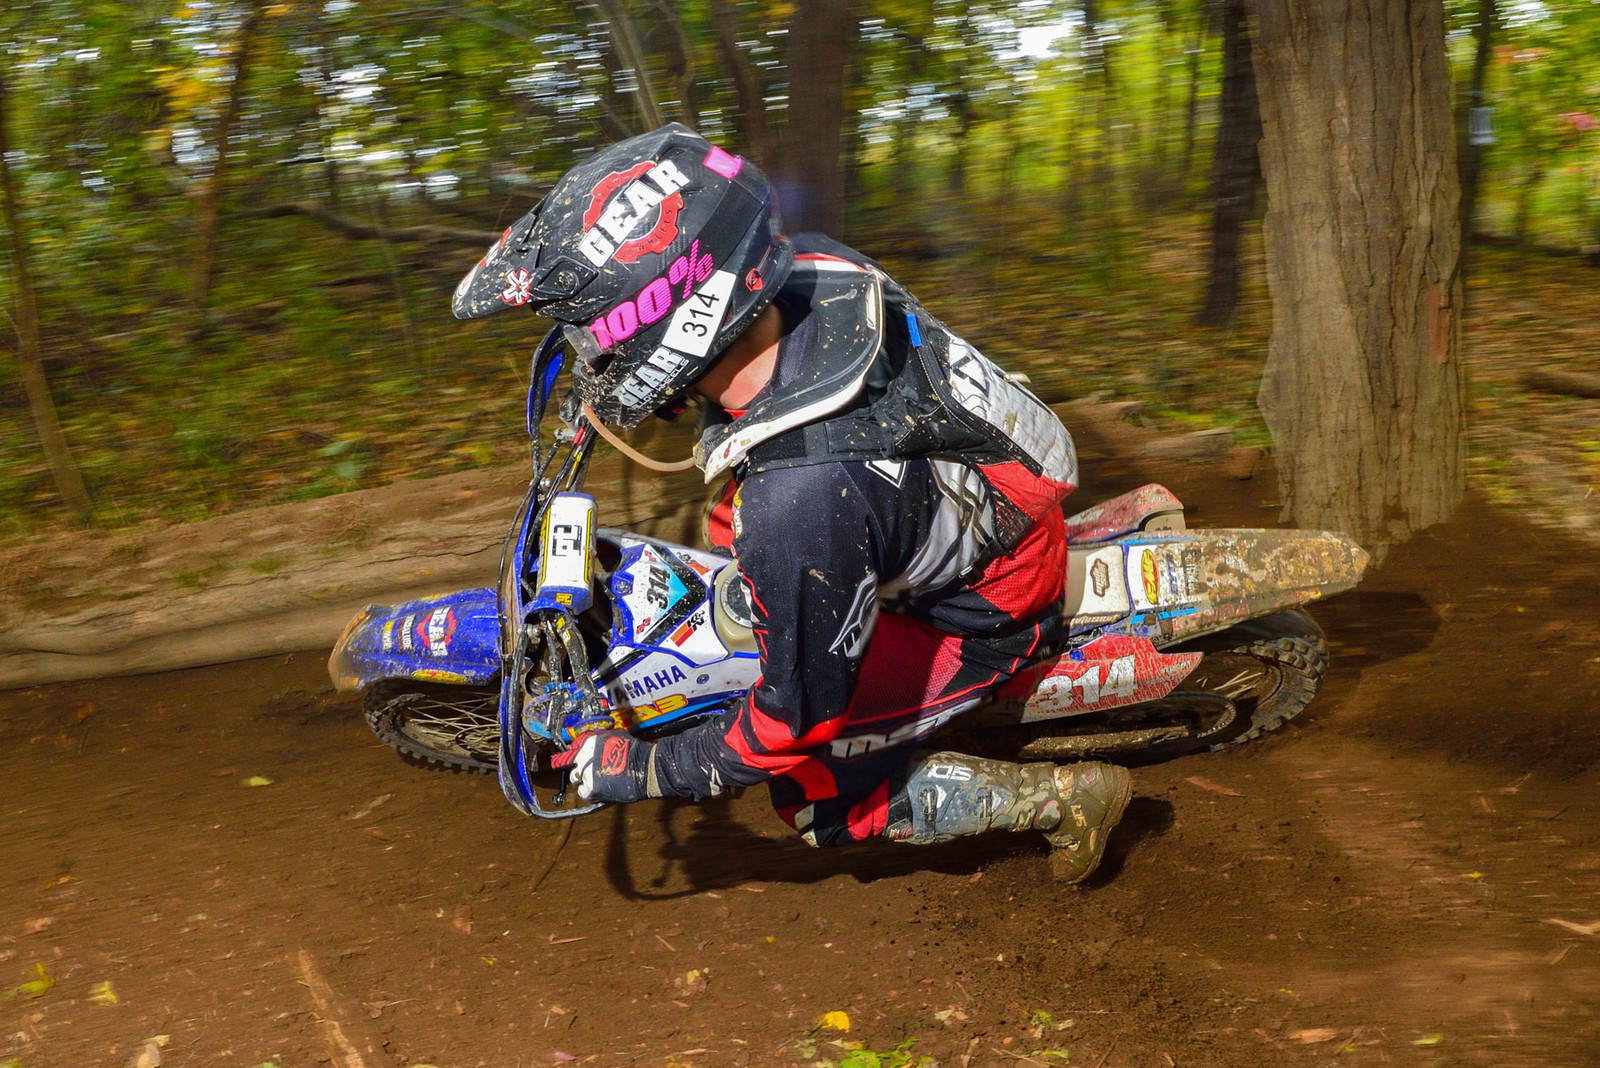 Grant Baylor - Photo Blast: Powerline Park GNCC - Motocross Pictures - Vital MX